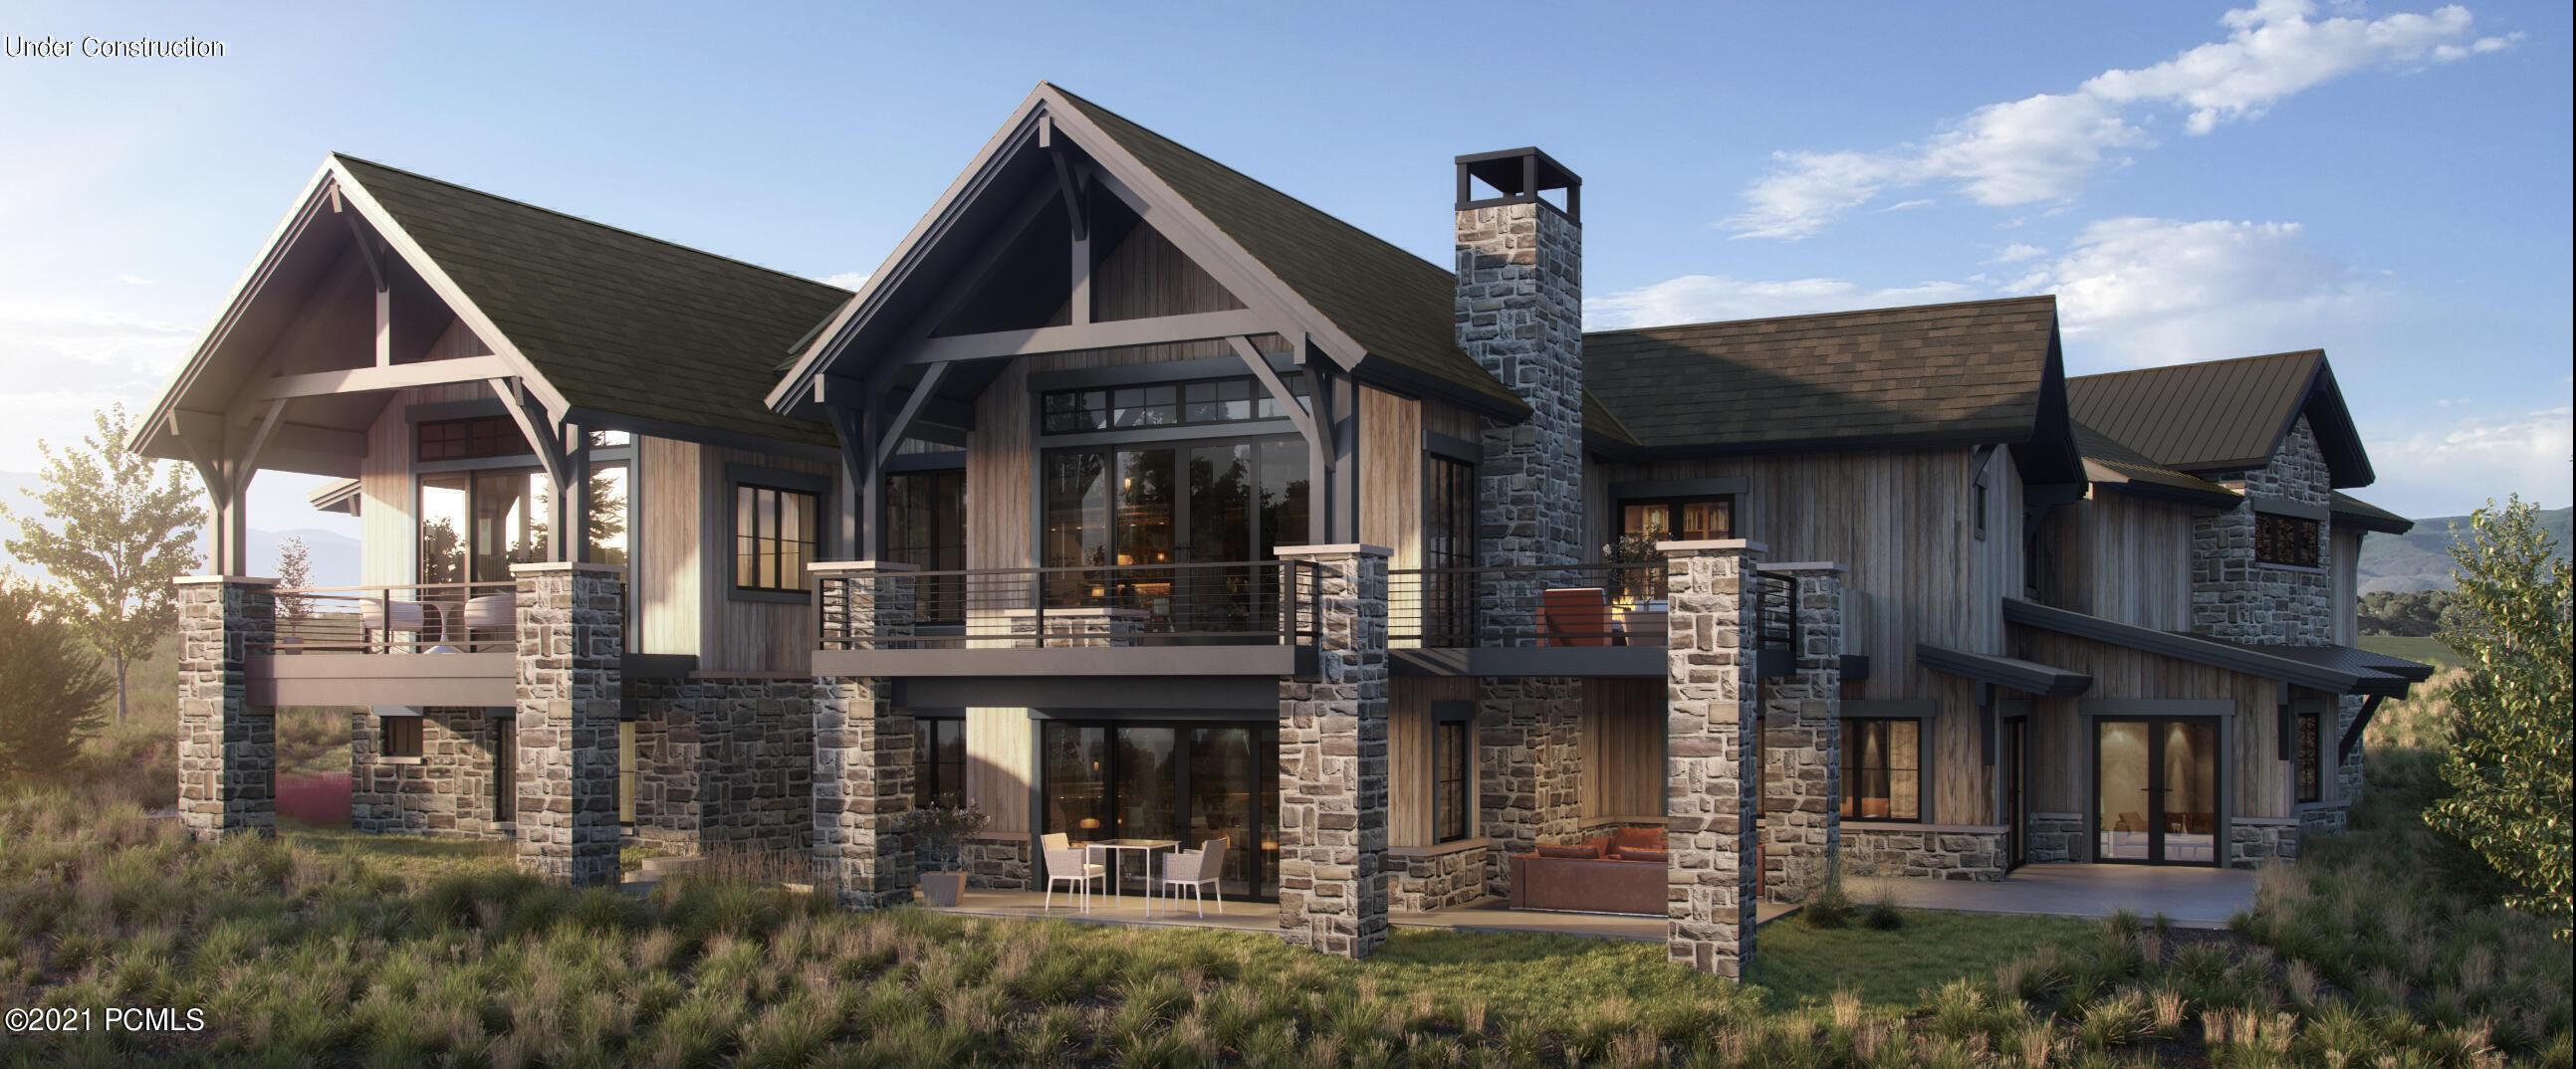 1254 Explorer Peak Drive, Heber City, Utah 84032, 4 Bedrooms Bedrooms, ,5 BathroomsBathrooms,Single Family,For Sale,Explorer Peak,12104187